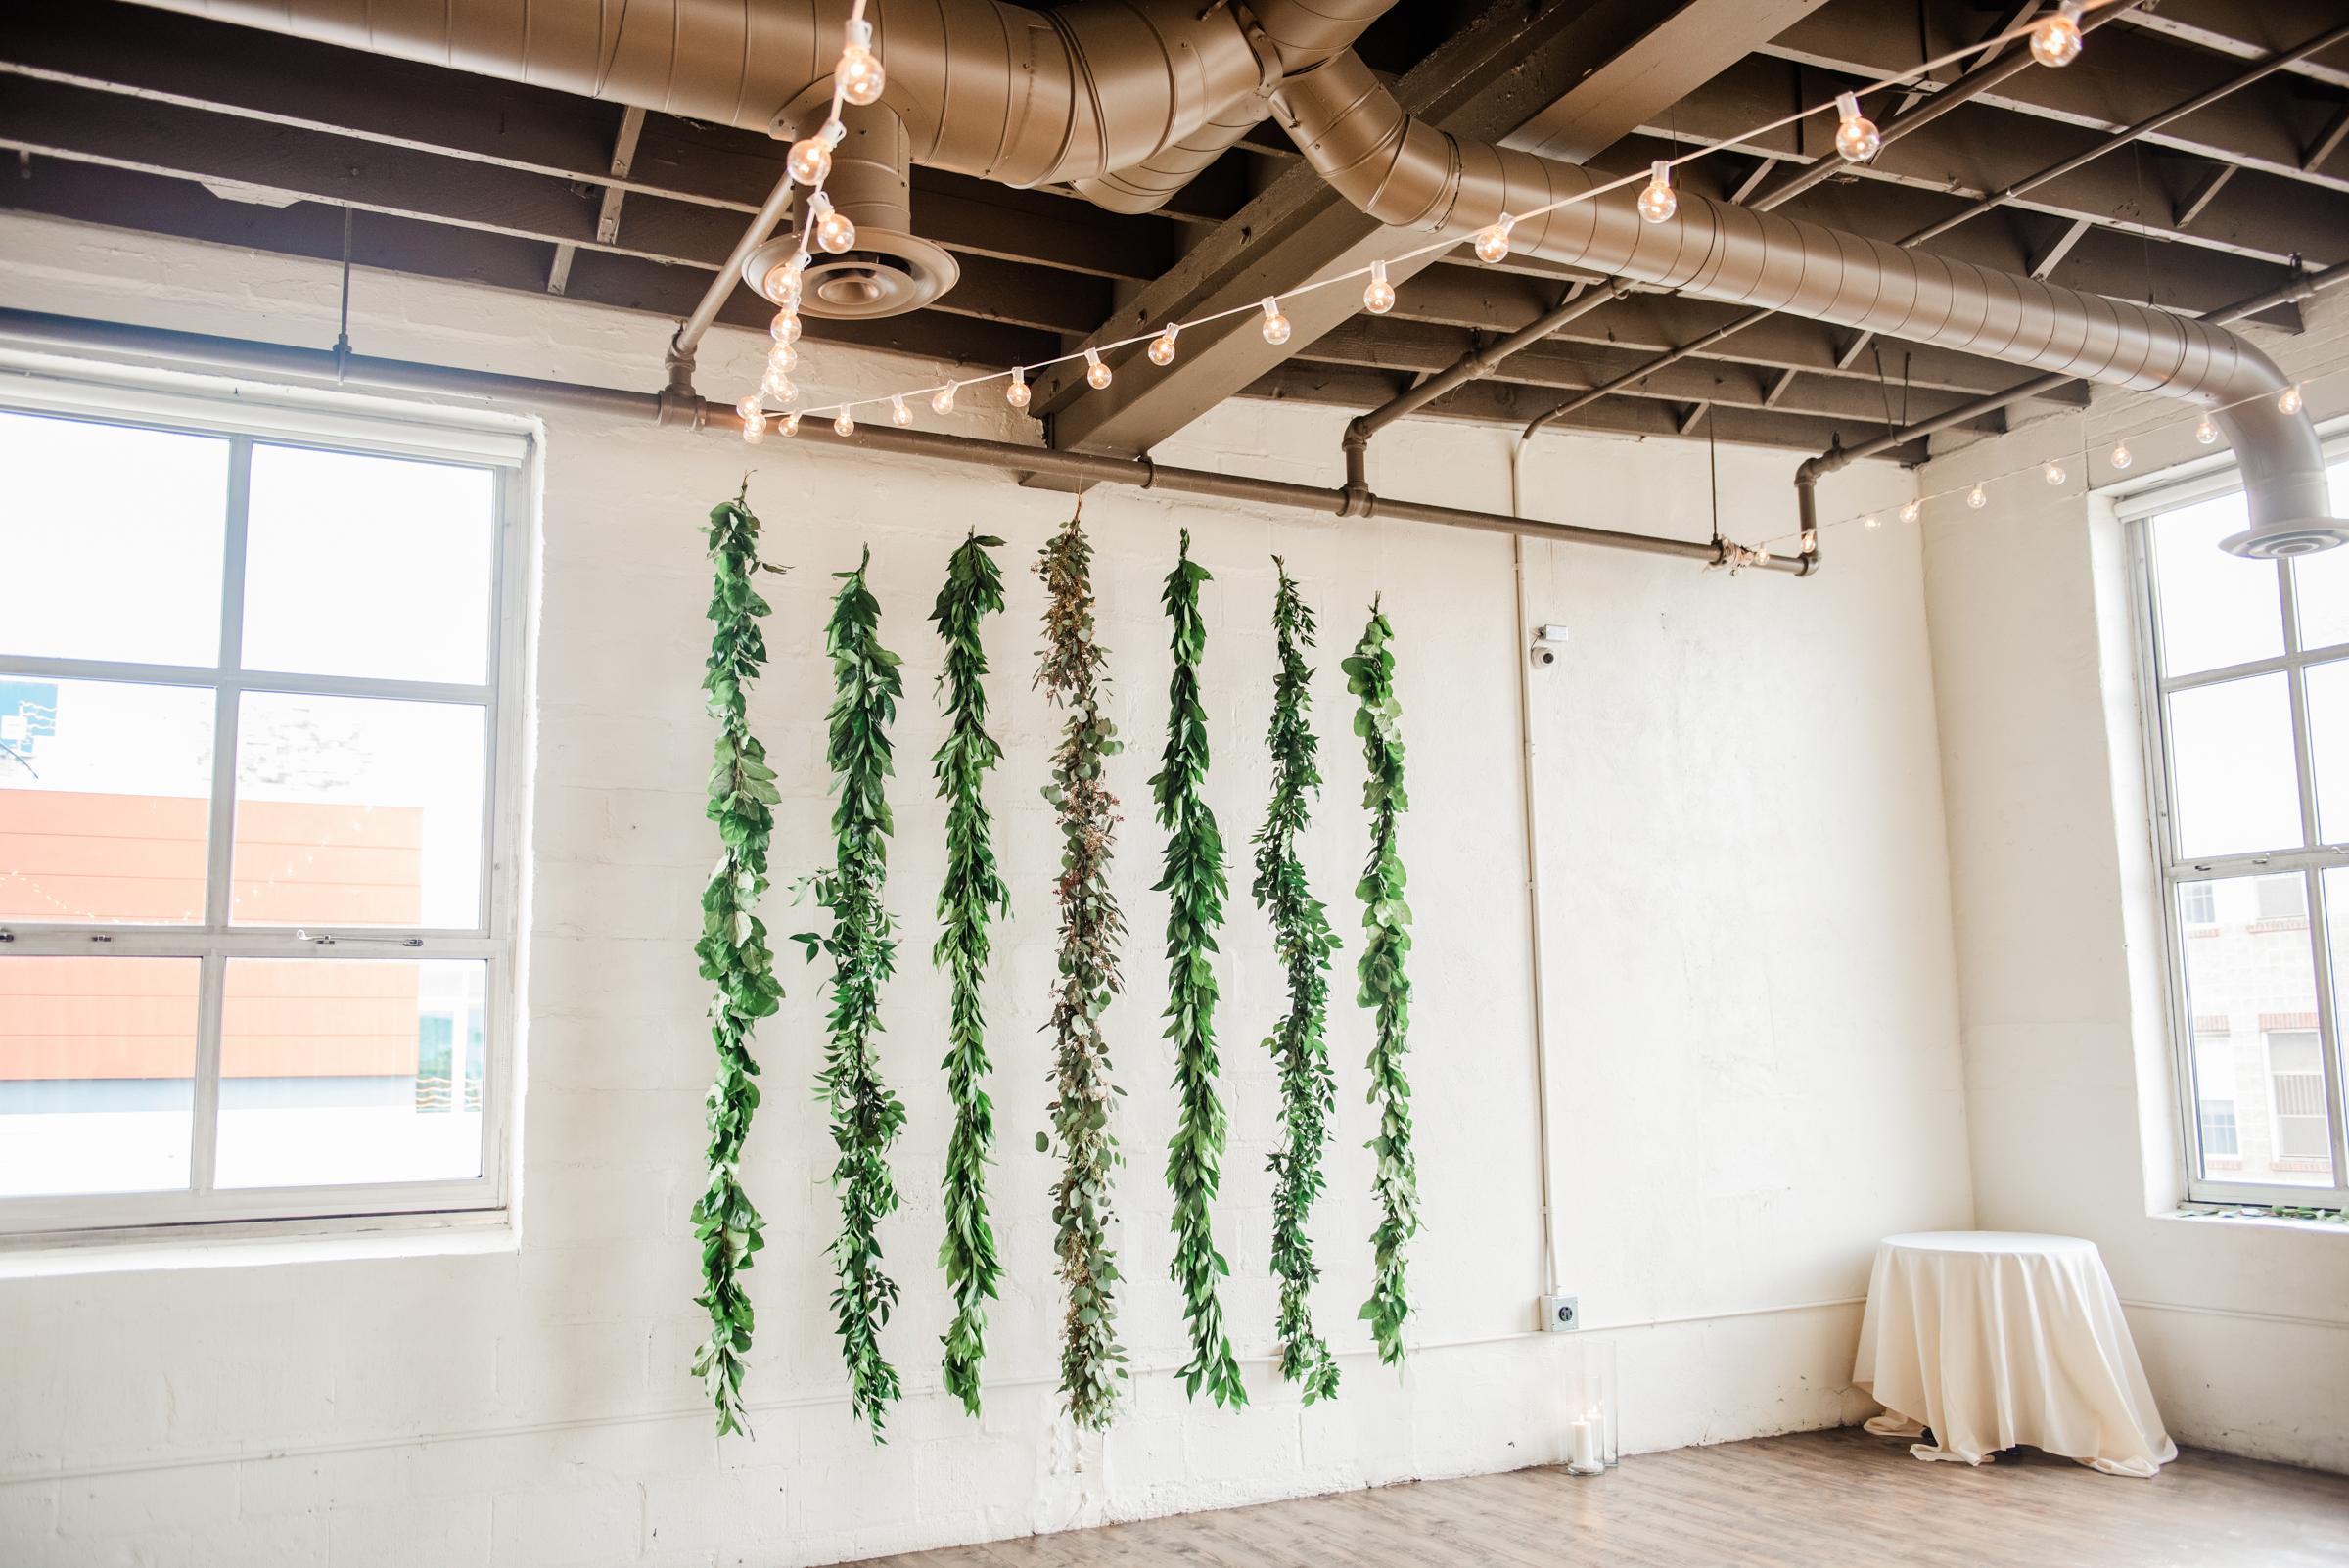 The_Arbor_LoftRochester_Wedding_JILL_STUDIO_Rochester_NY_Photographer_173725.jpg